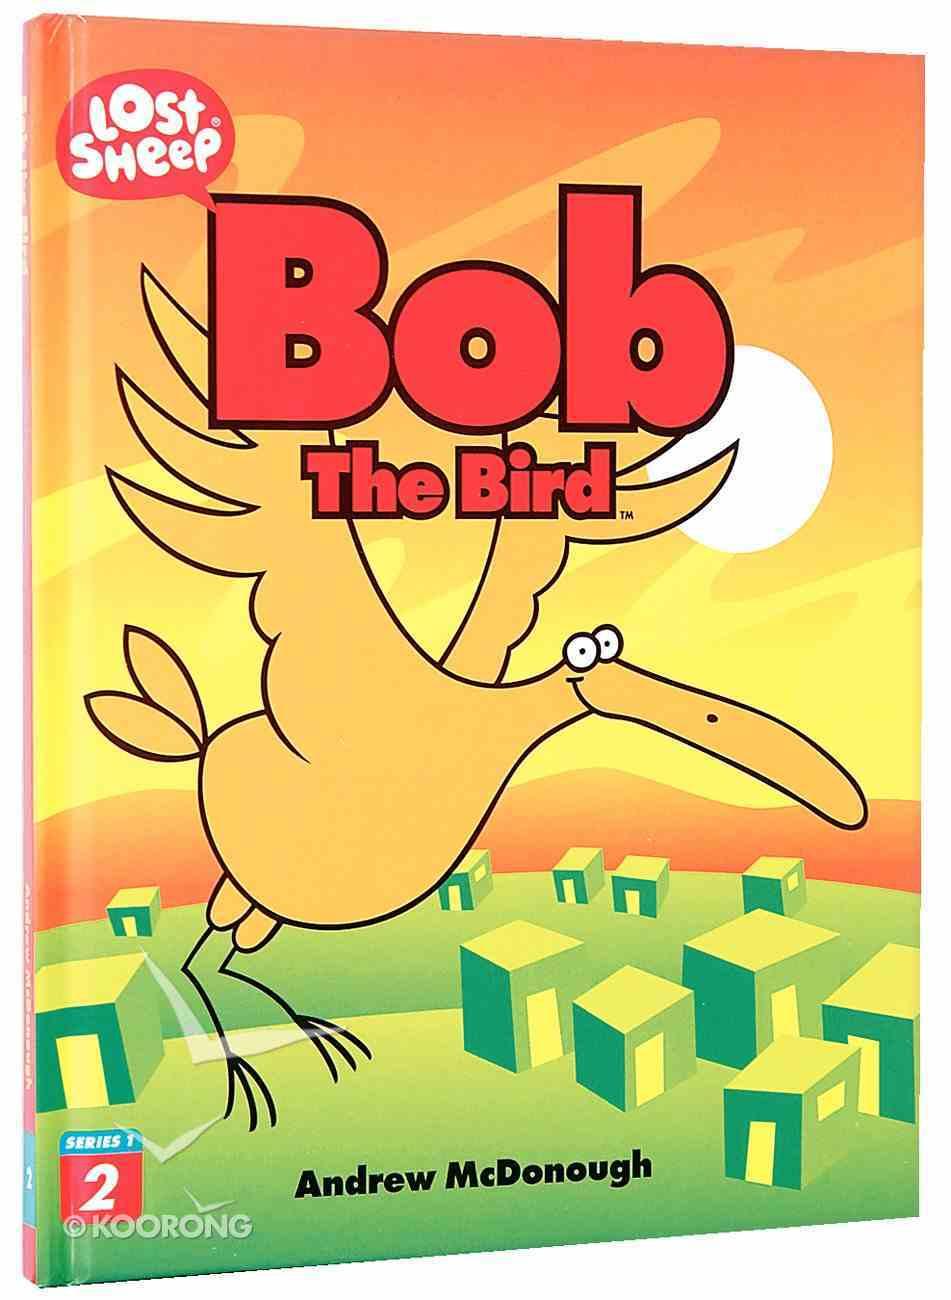 Bob, the Bird (Lost Sheep Series) Hardback